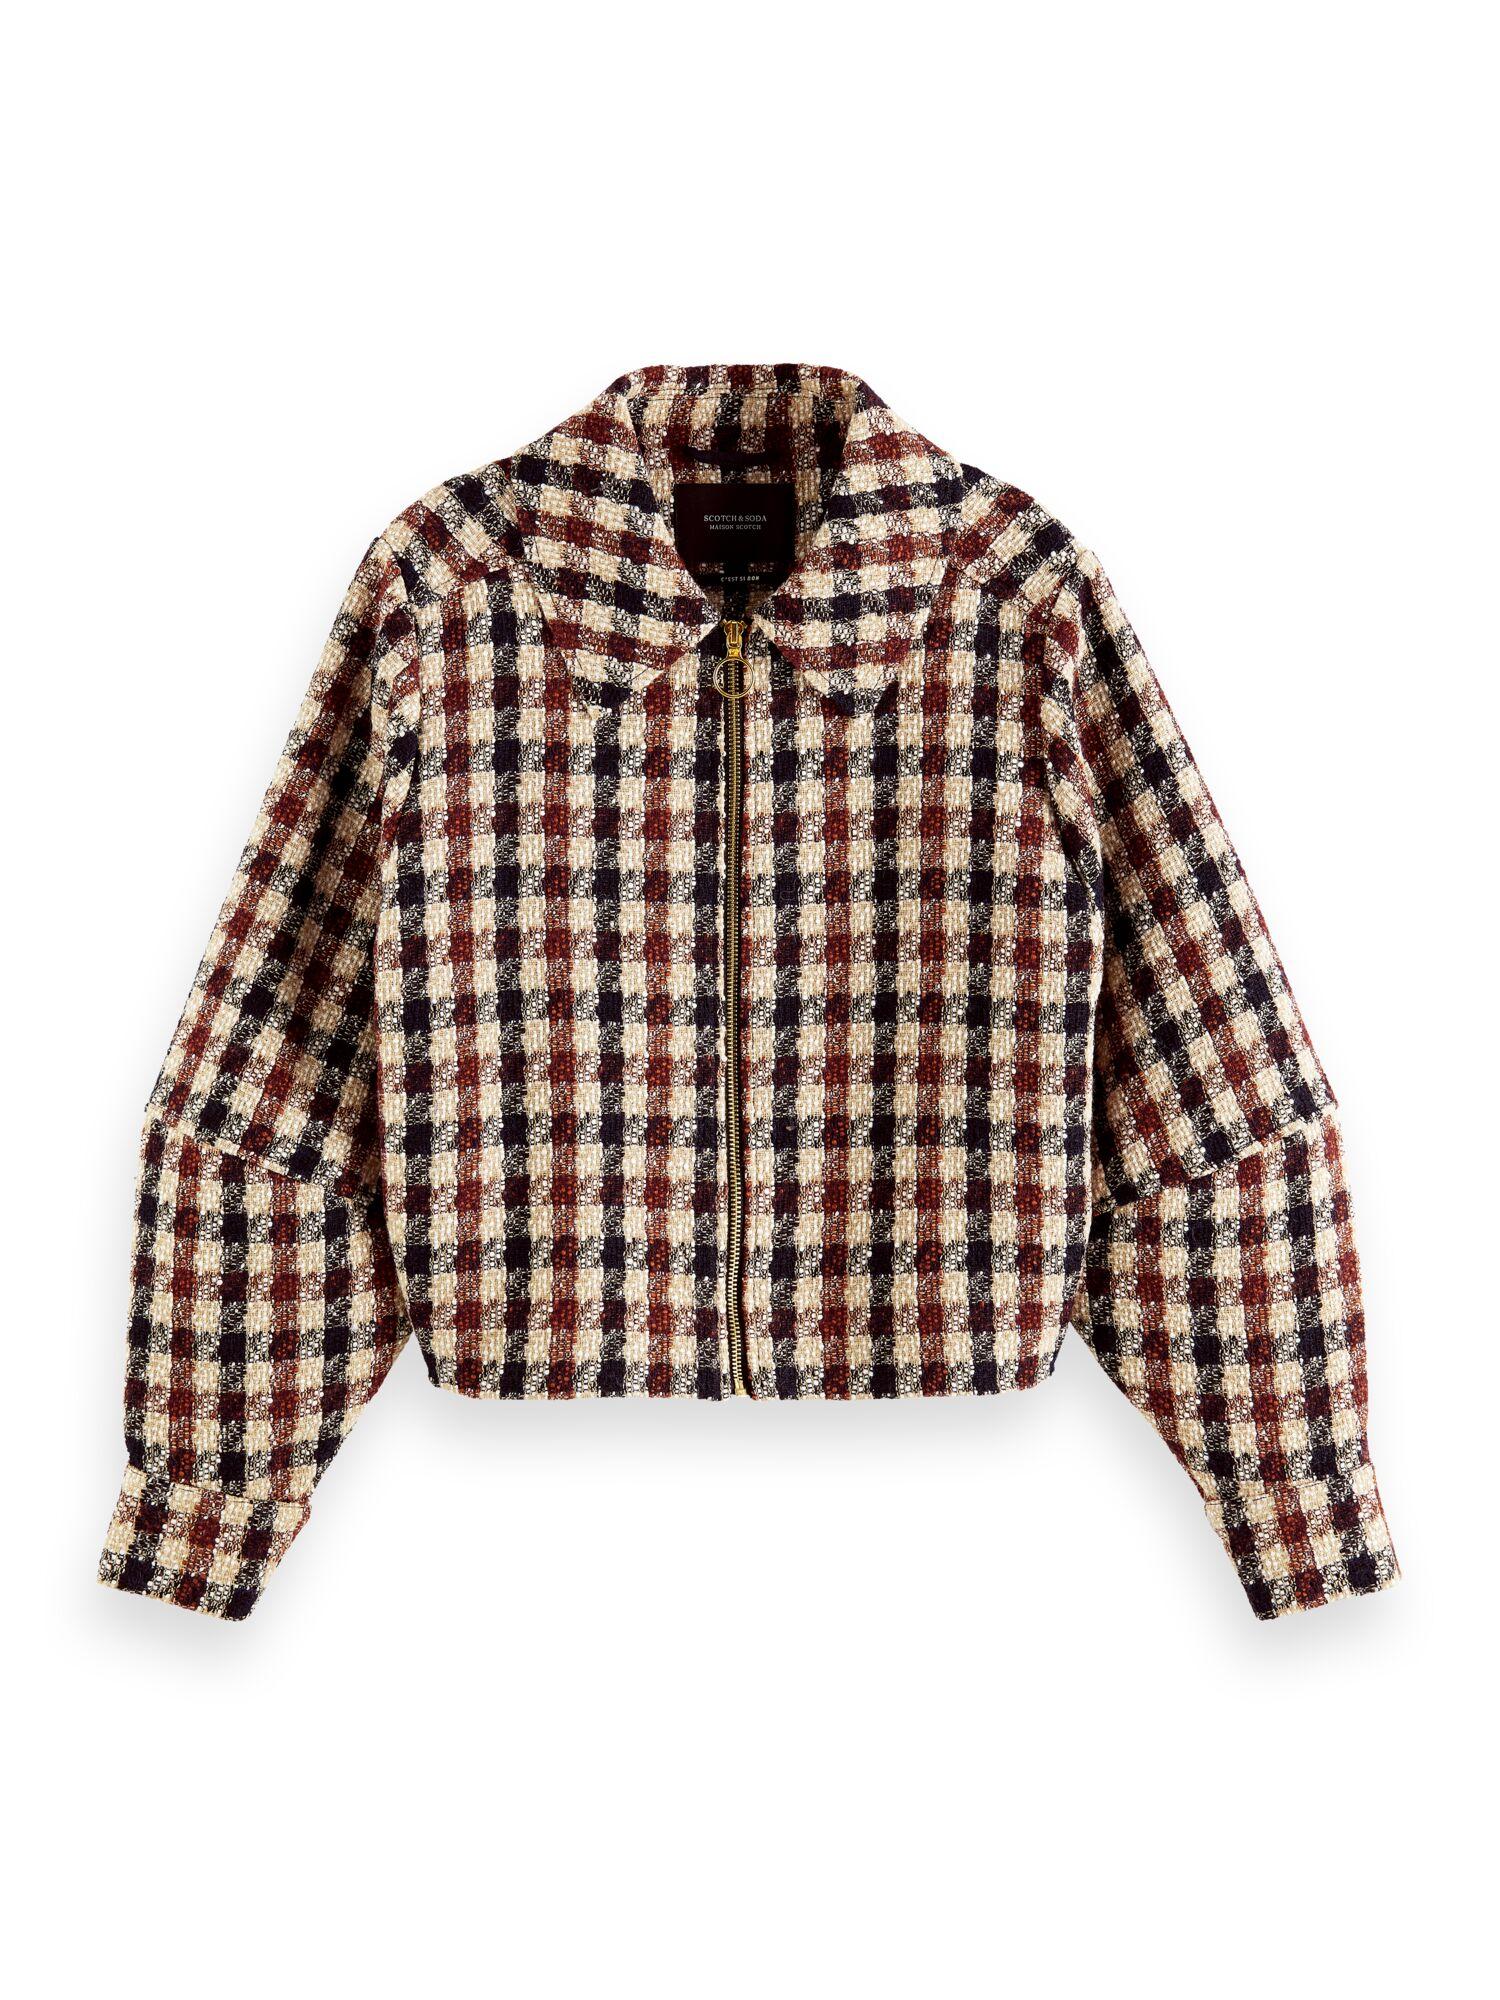 Scotch & Soda   Short tweed jacket